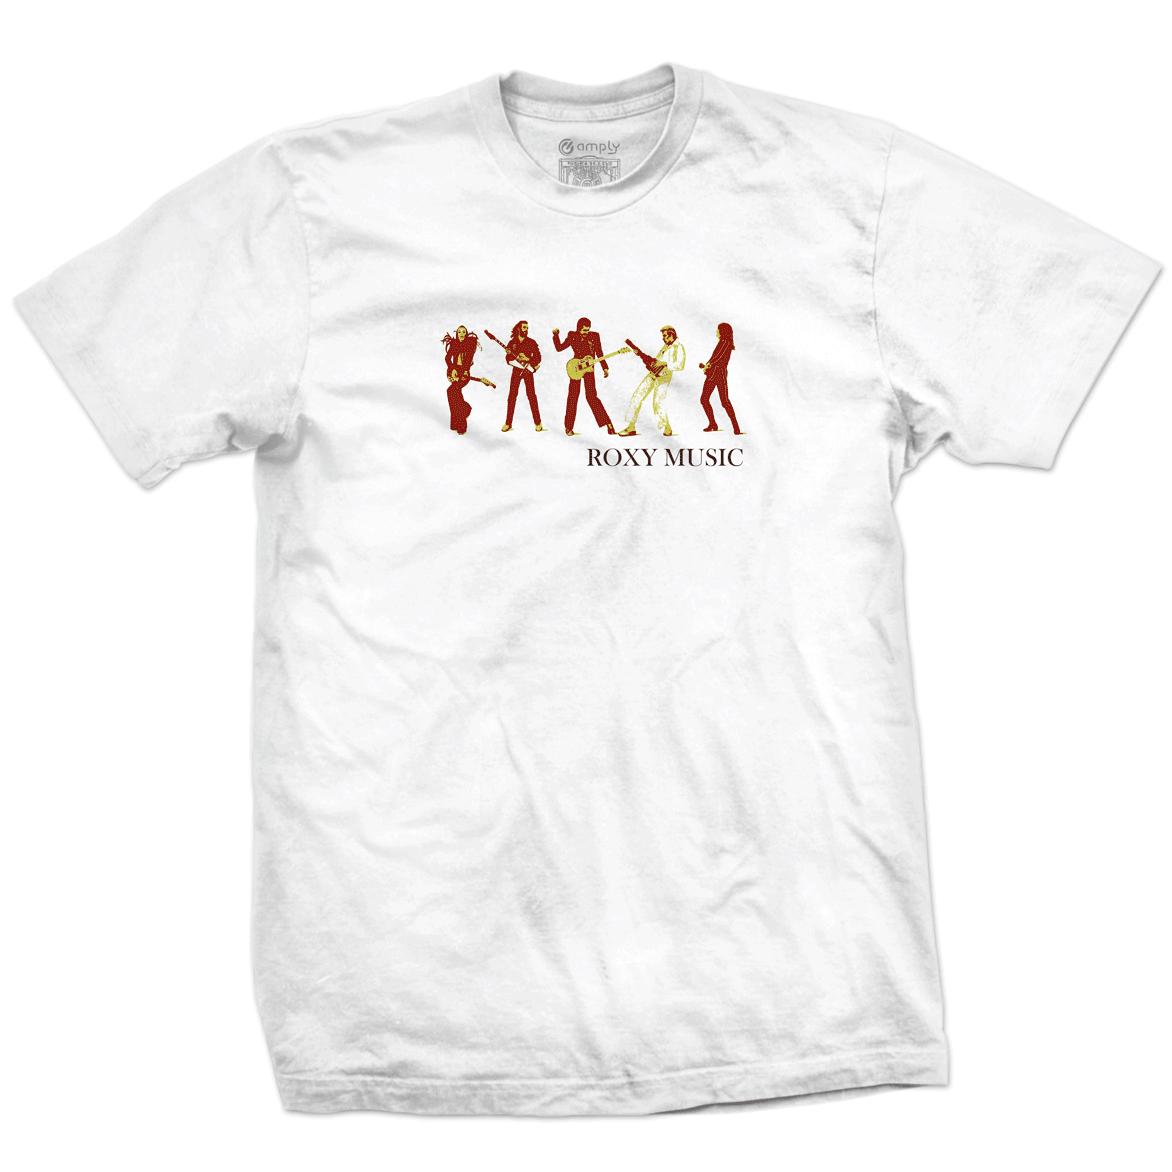 Camiseta Roxy Music